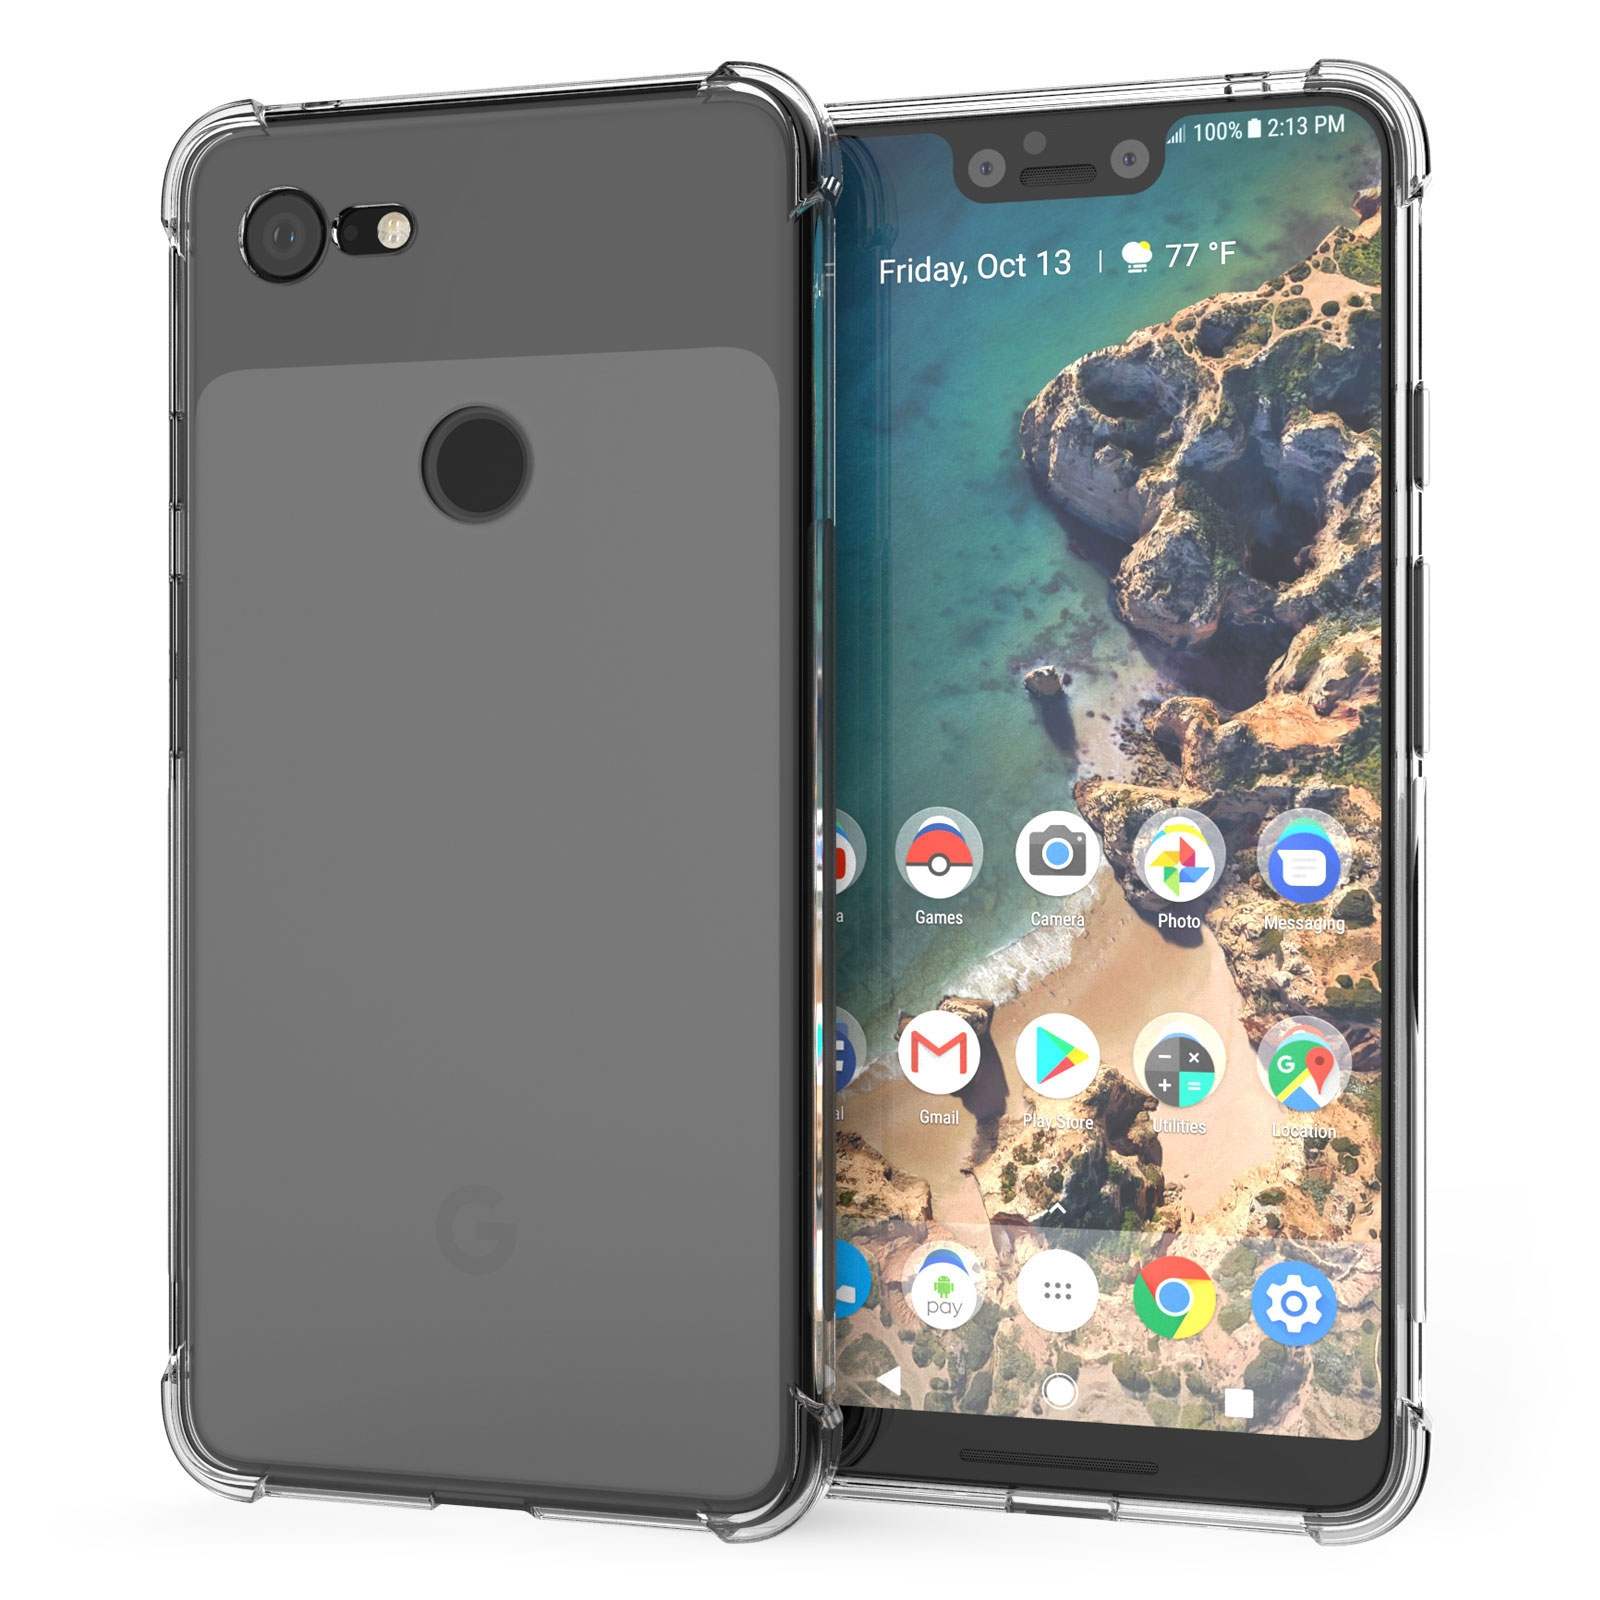 Caseflex Θήκη Σιλικόνης Google Pixel 3 XL - Clear (CS0002GOXL)